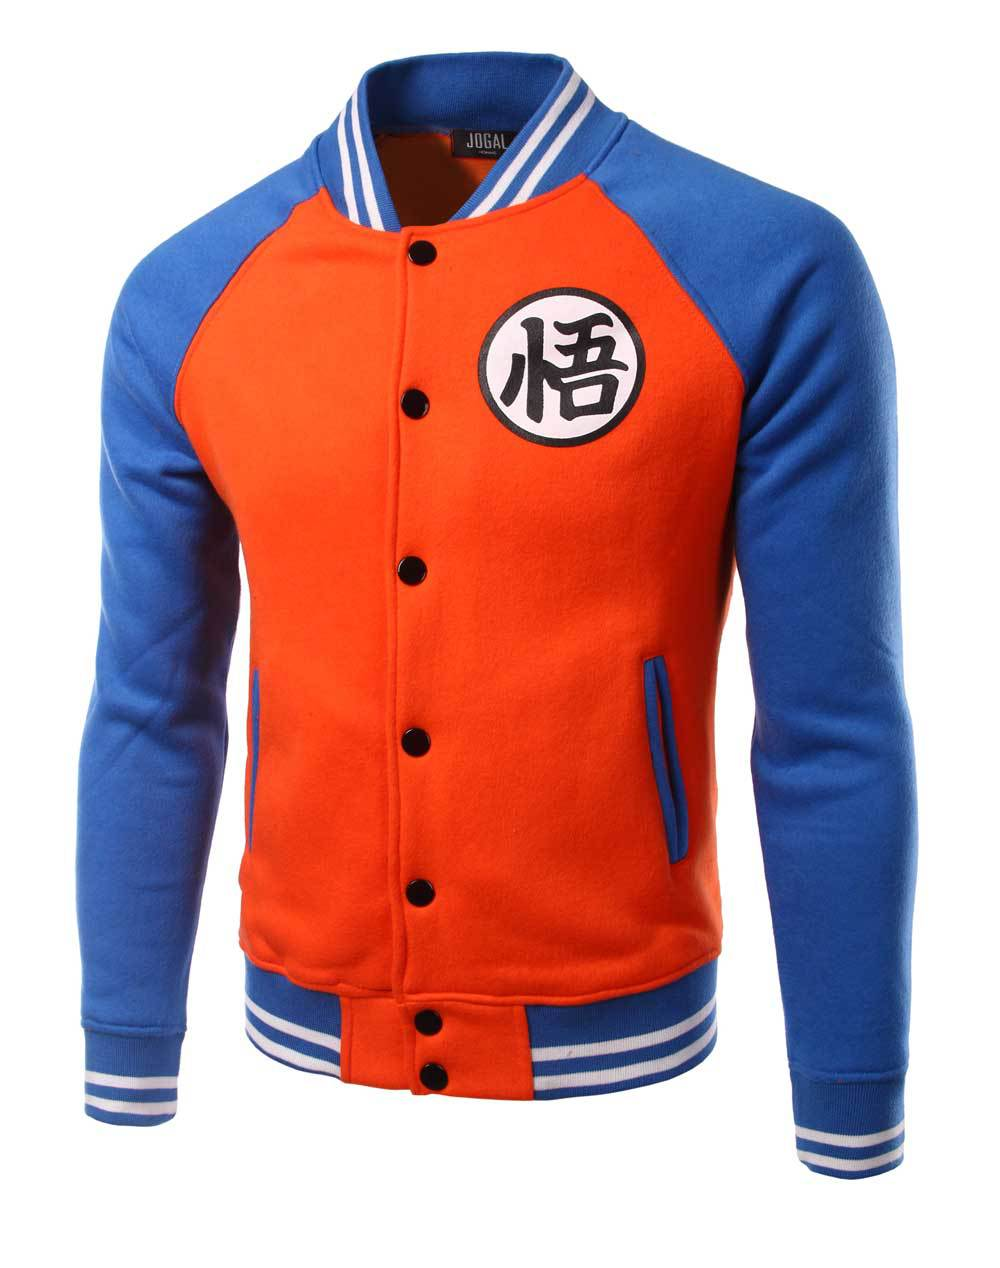 Hot Dragon ball GOKU font b hoodies b font blue with orange dragon ball font b